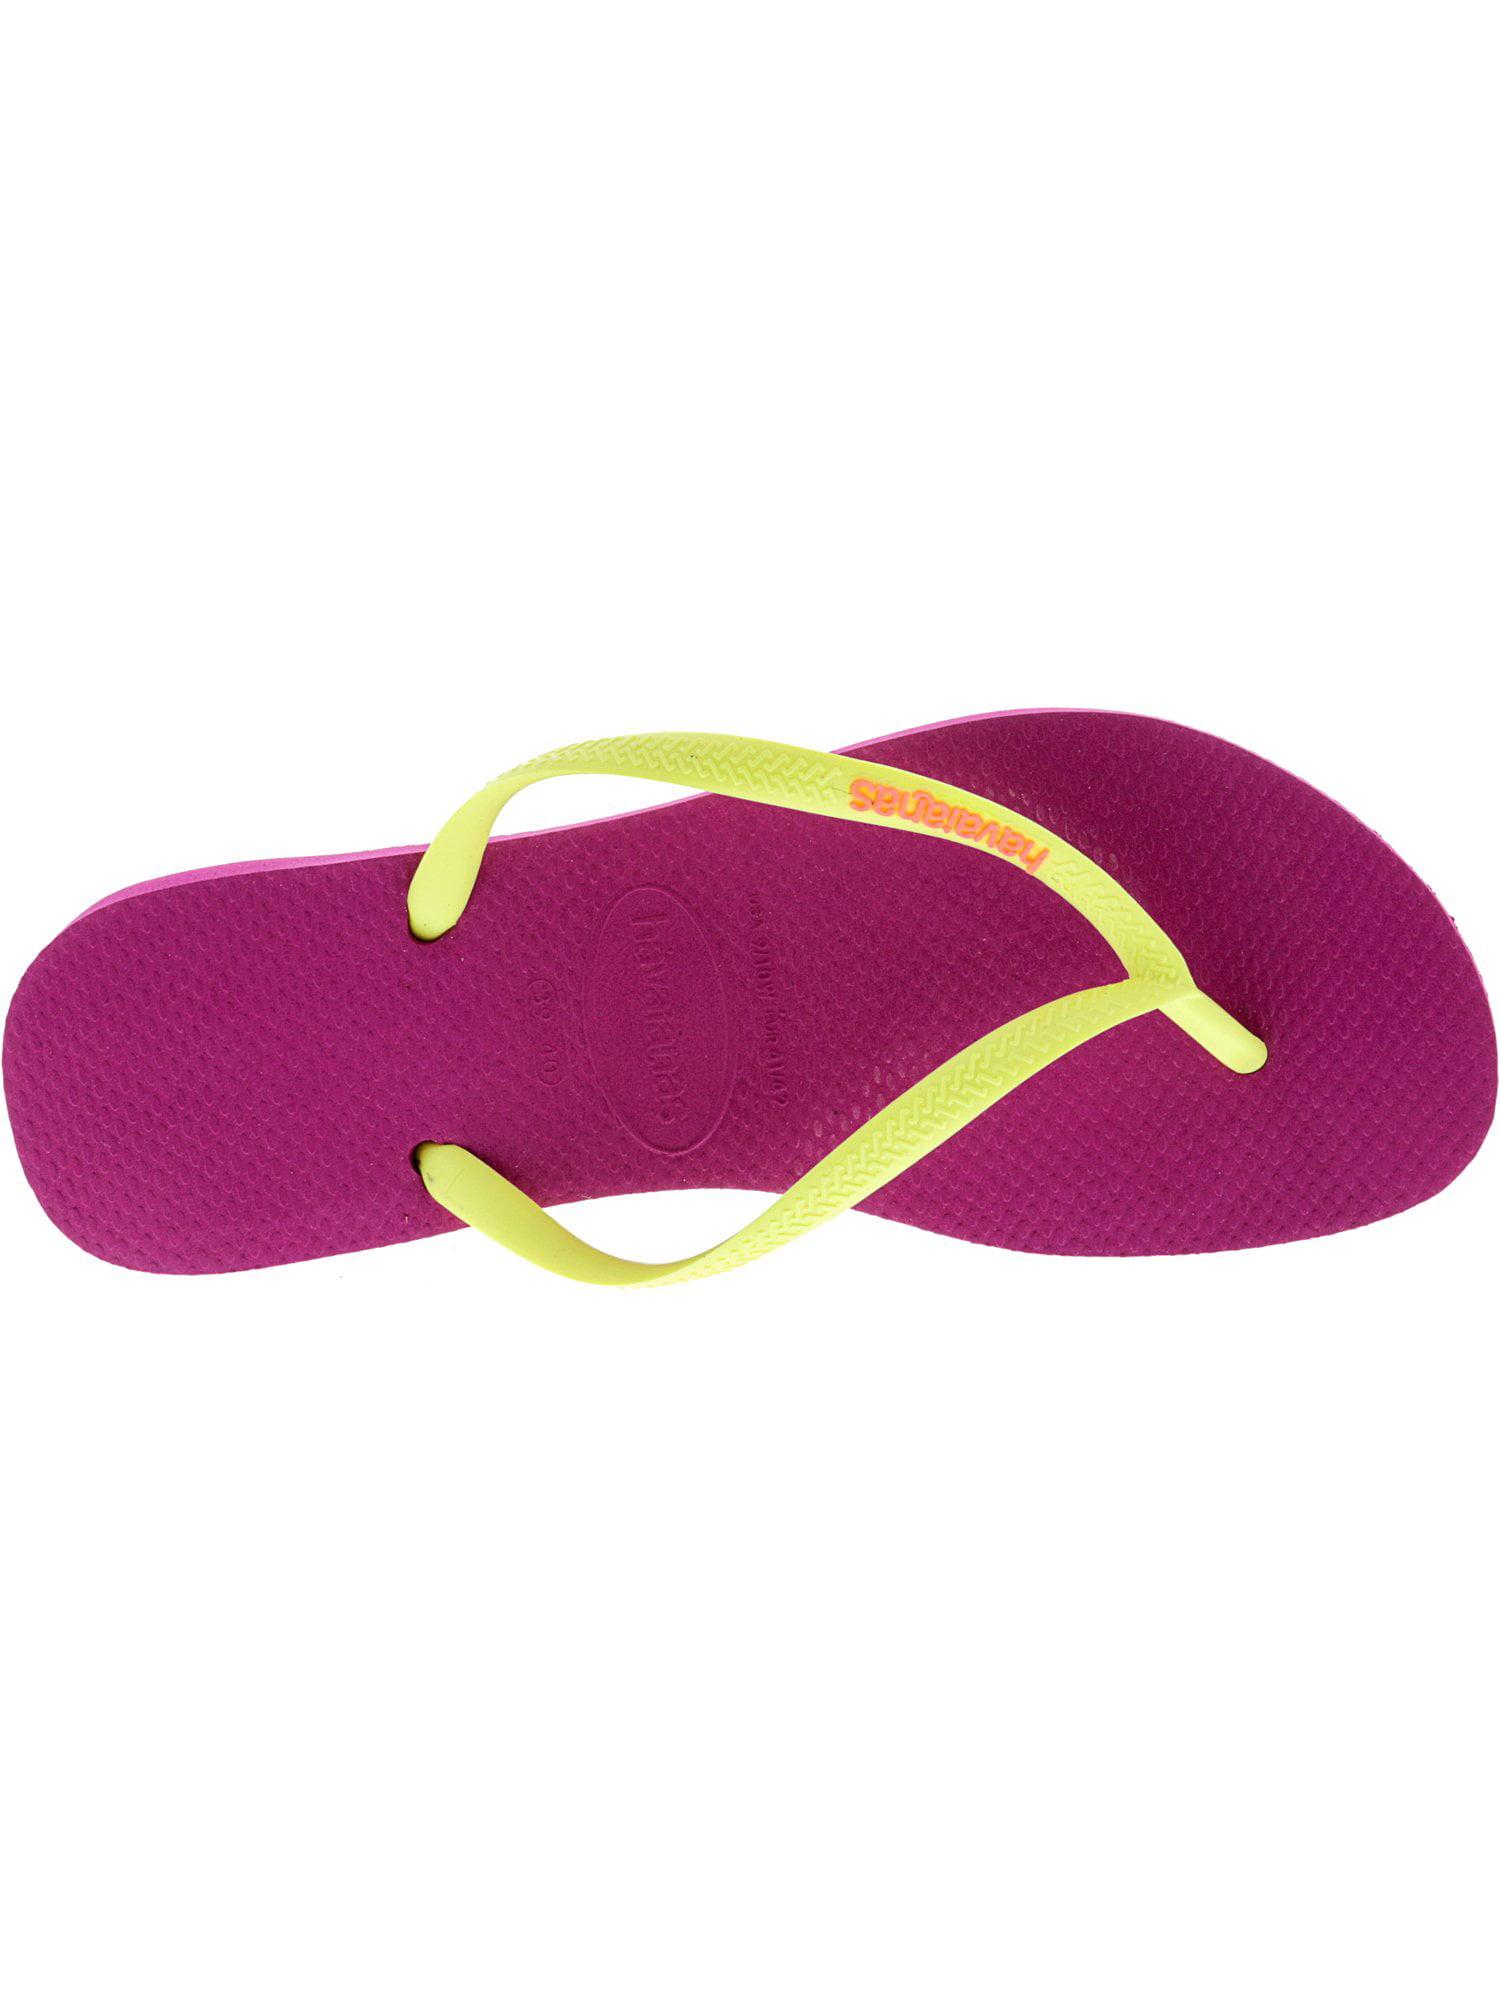 559fafd618c8e0 Havaianas Women s Slim Logo Pop-Up Navy   Red Ruby Rubber Sandal - 9M